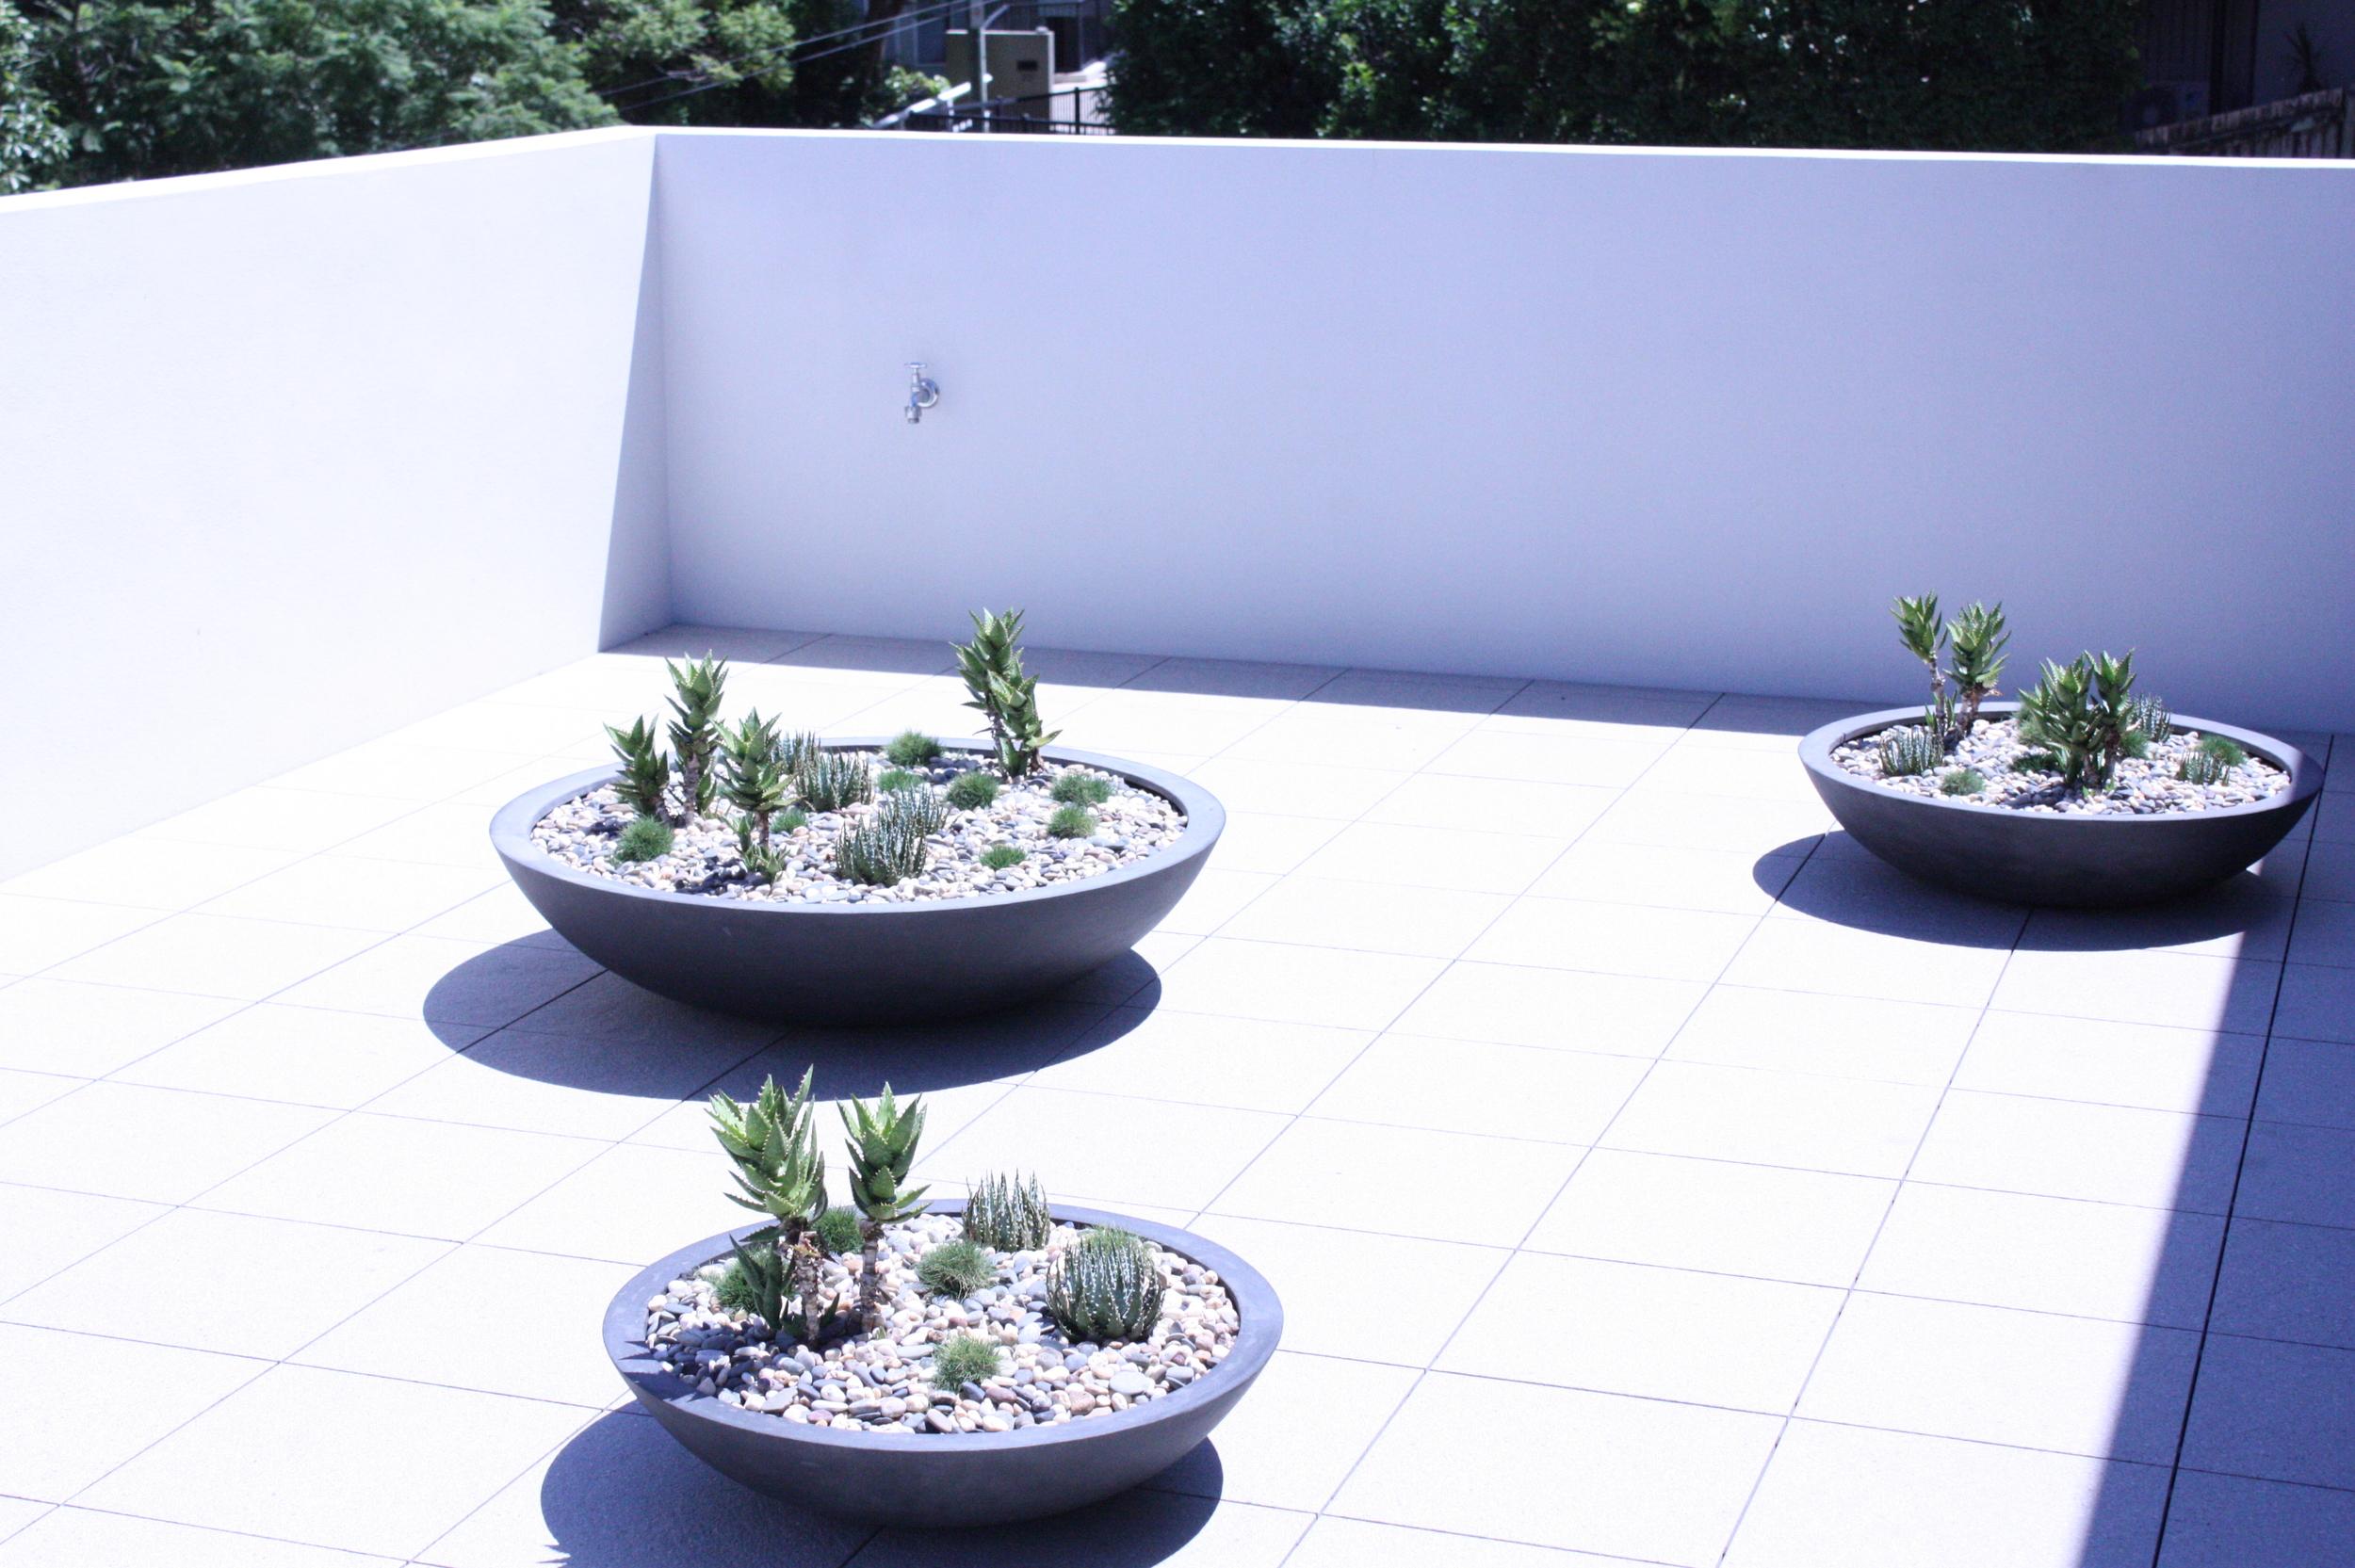 hamilton-rooftop-landscape-design-SEED7.JPG